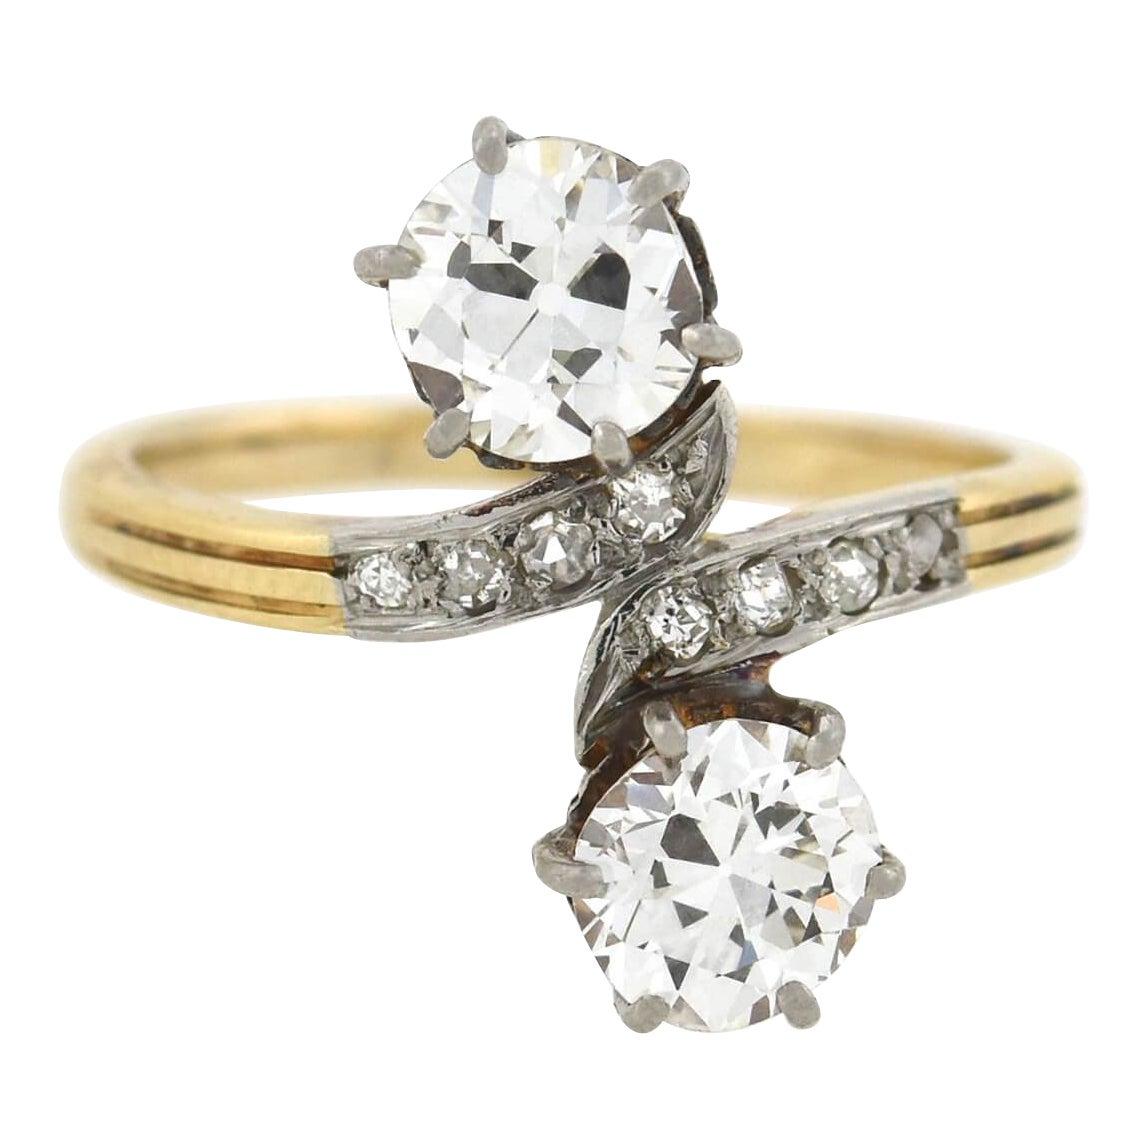 "Edwardian ""Moi et Toi"" 1.60 Total Carat Diamond Bypass Ring"